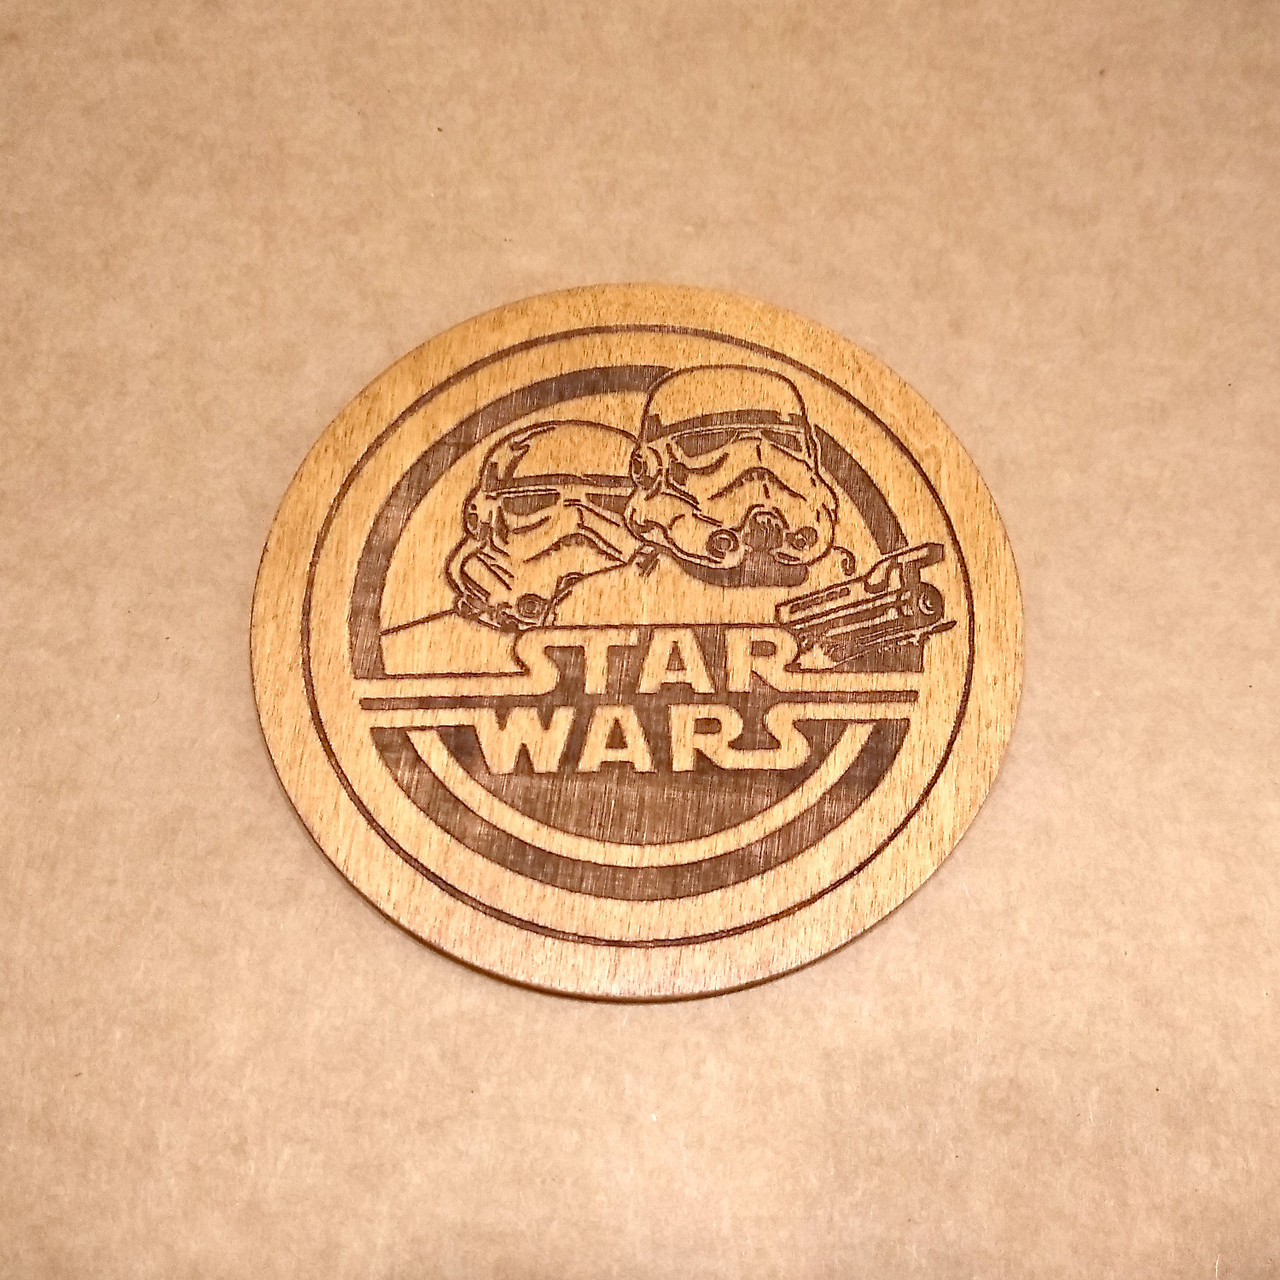 Костер деревянный. Подставка под кружку Star Wars.